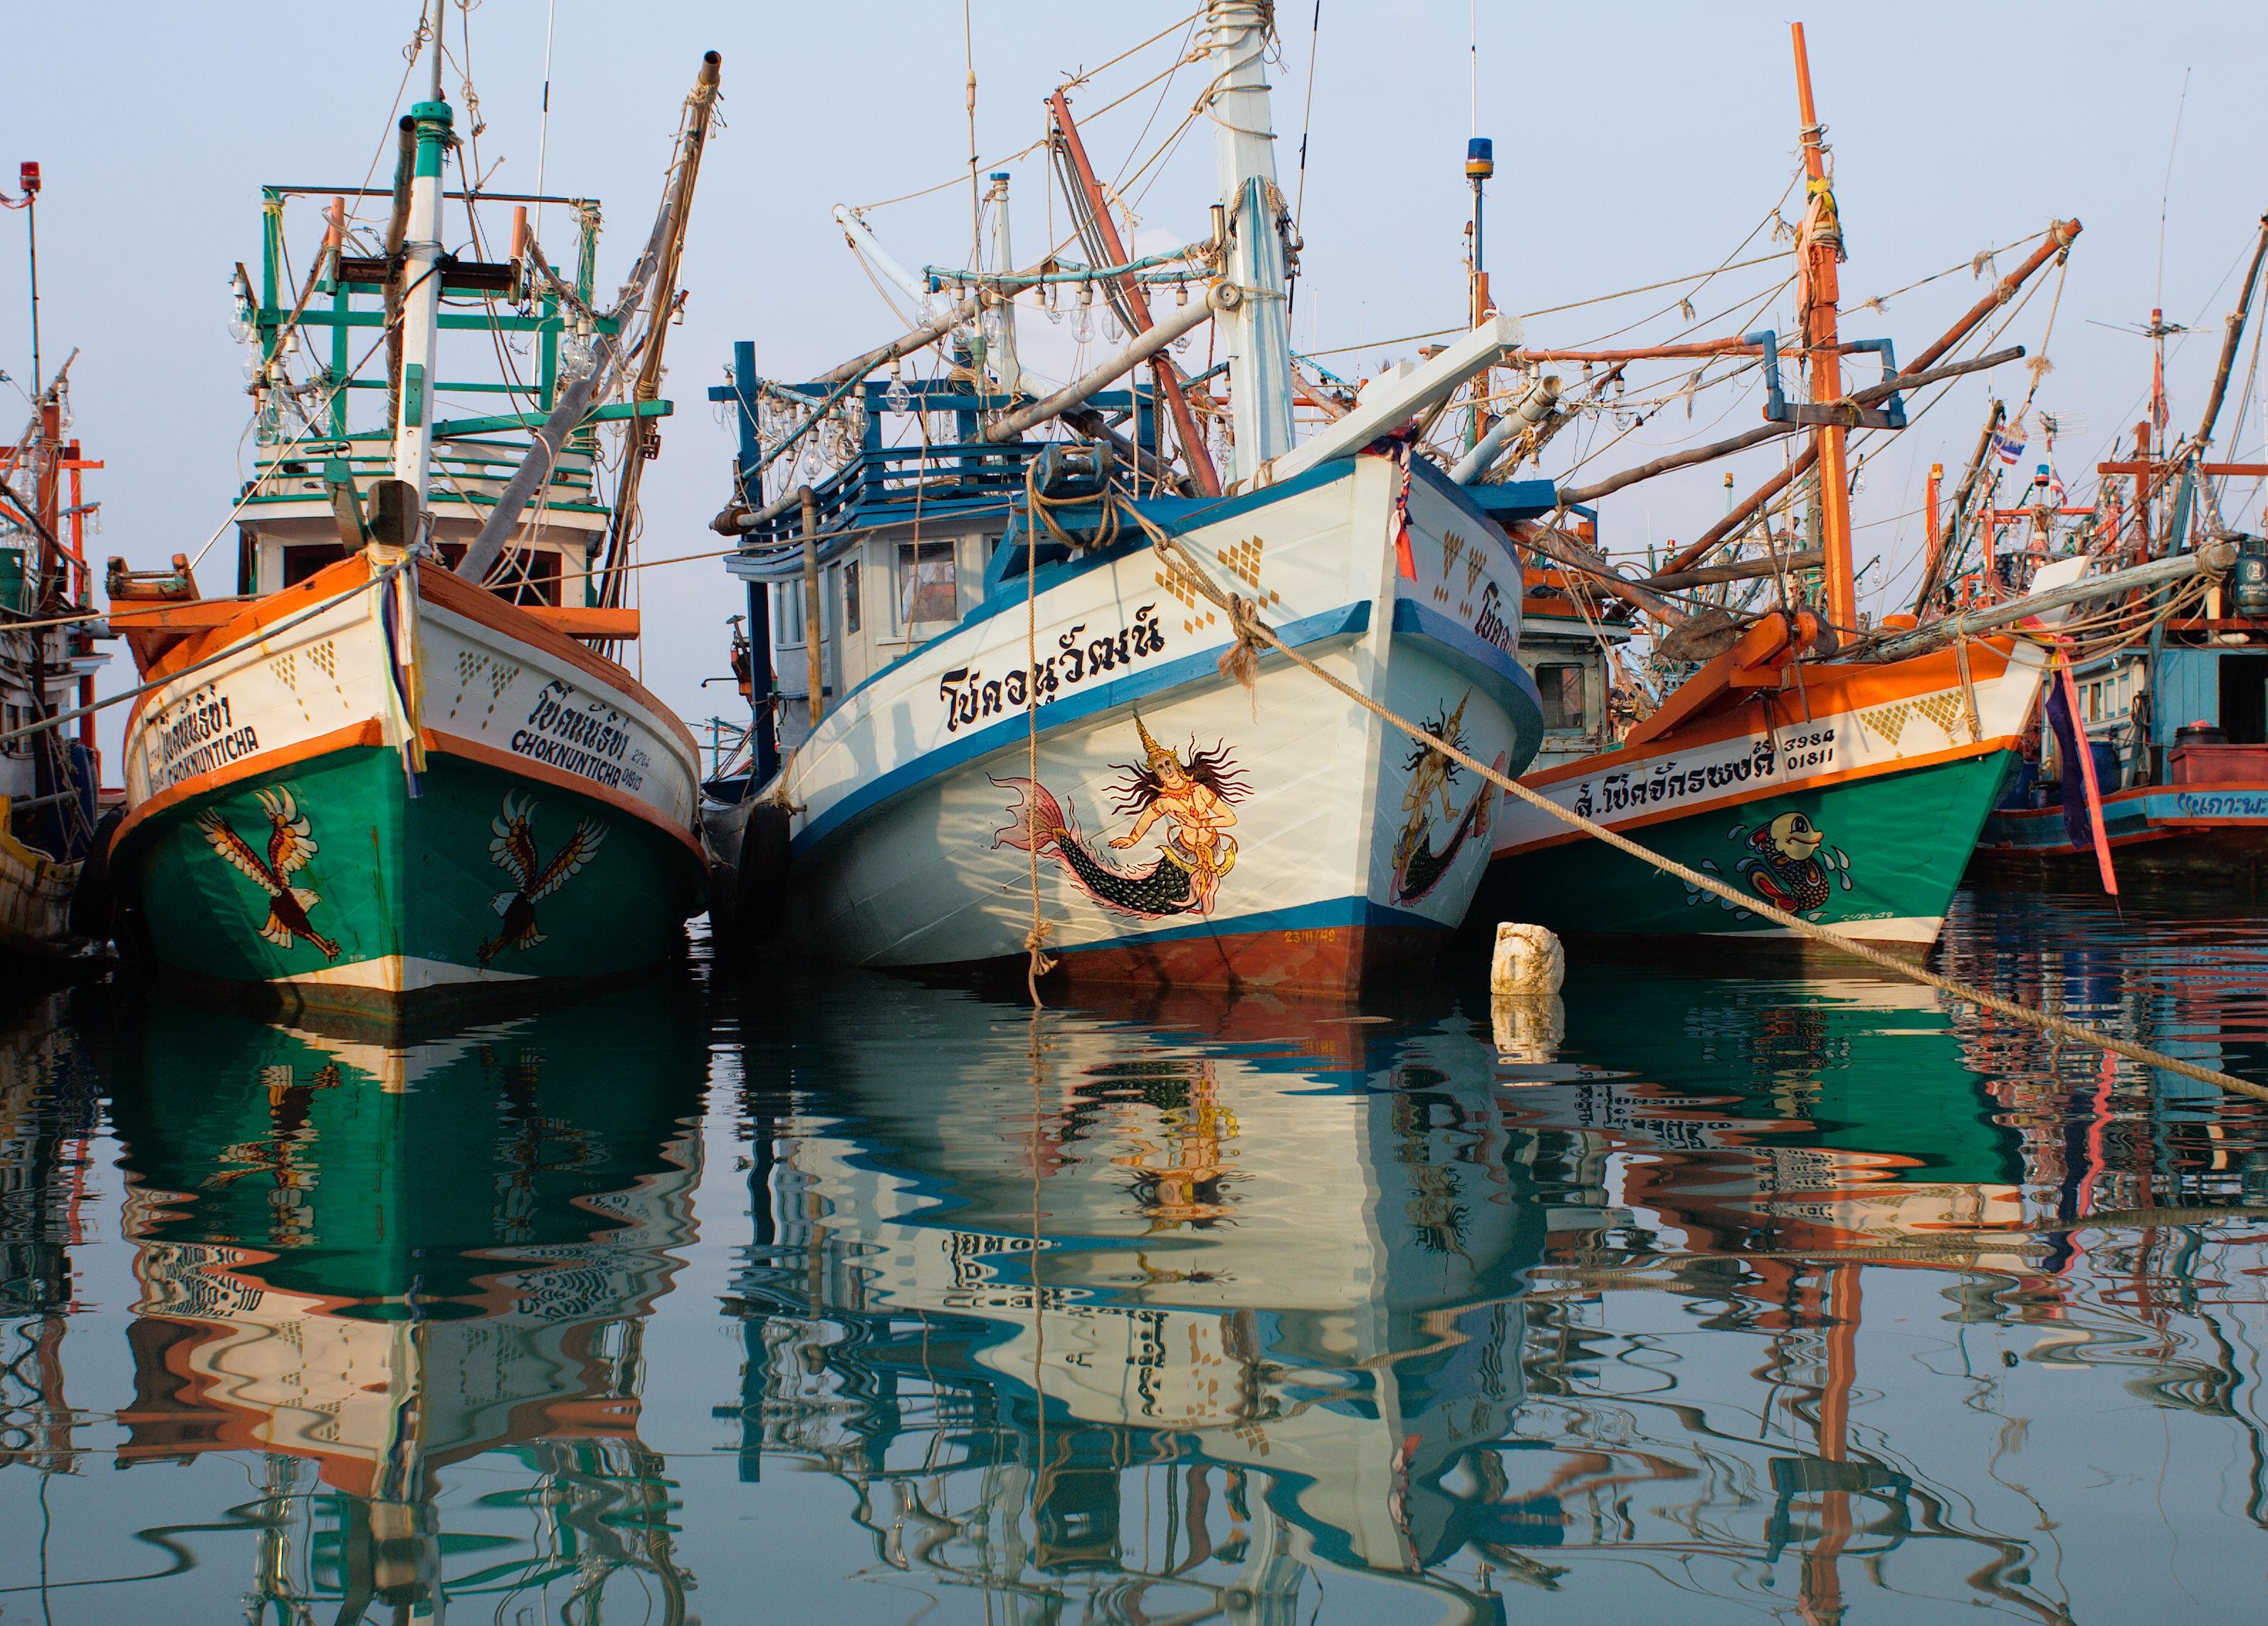 San Francisco 39 S Fisherman 39 S Wharf Boats 4272 2848